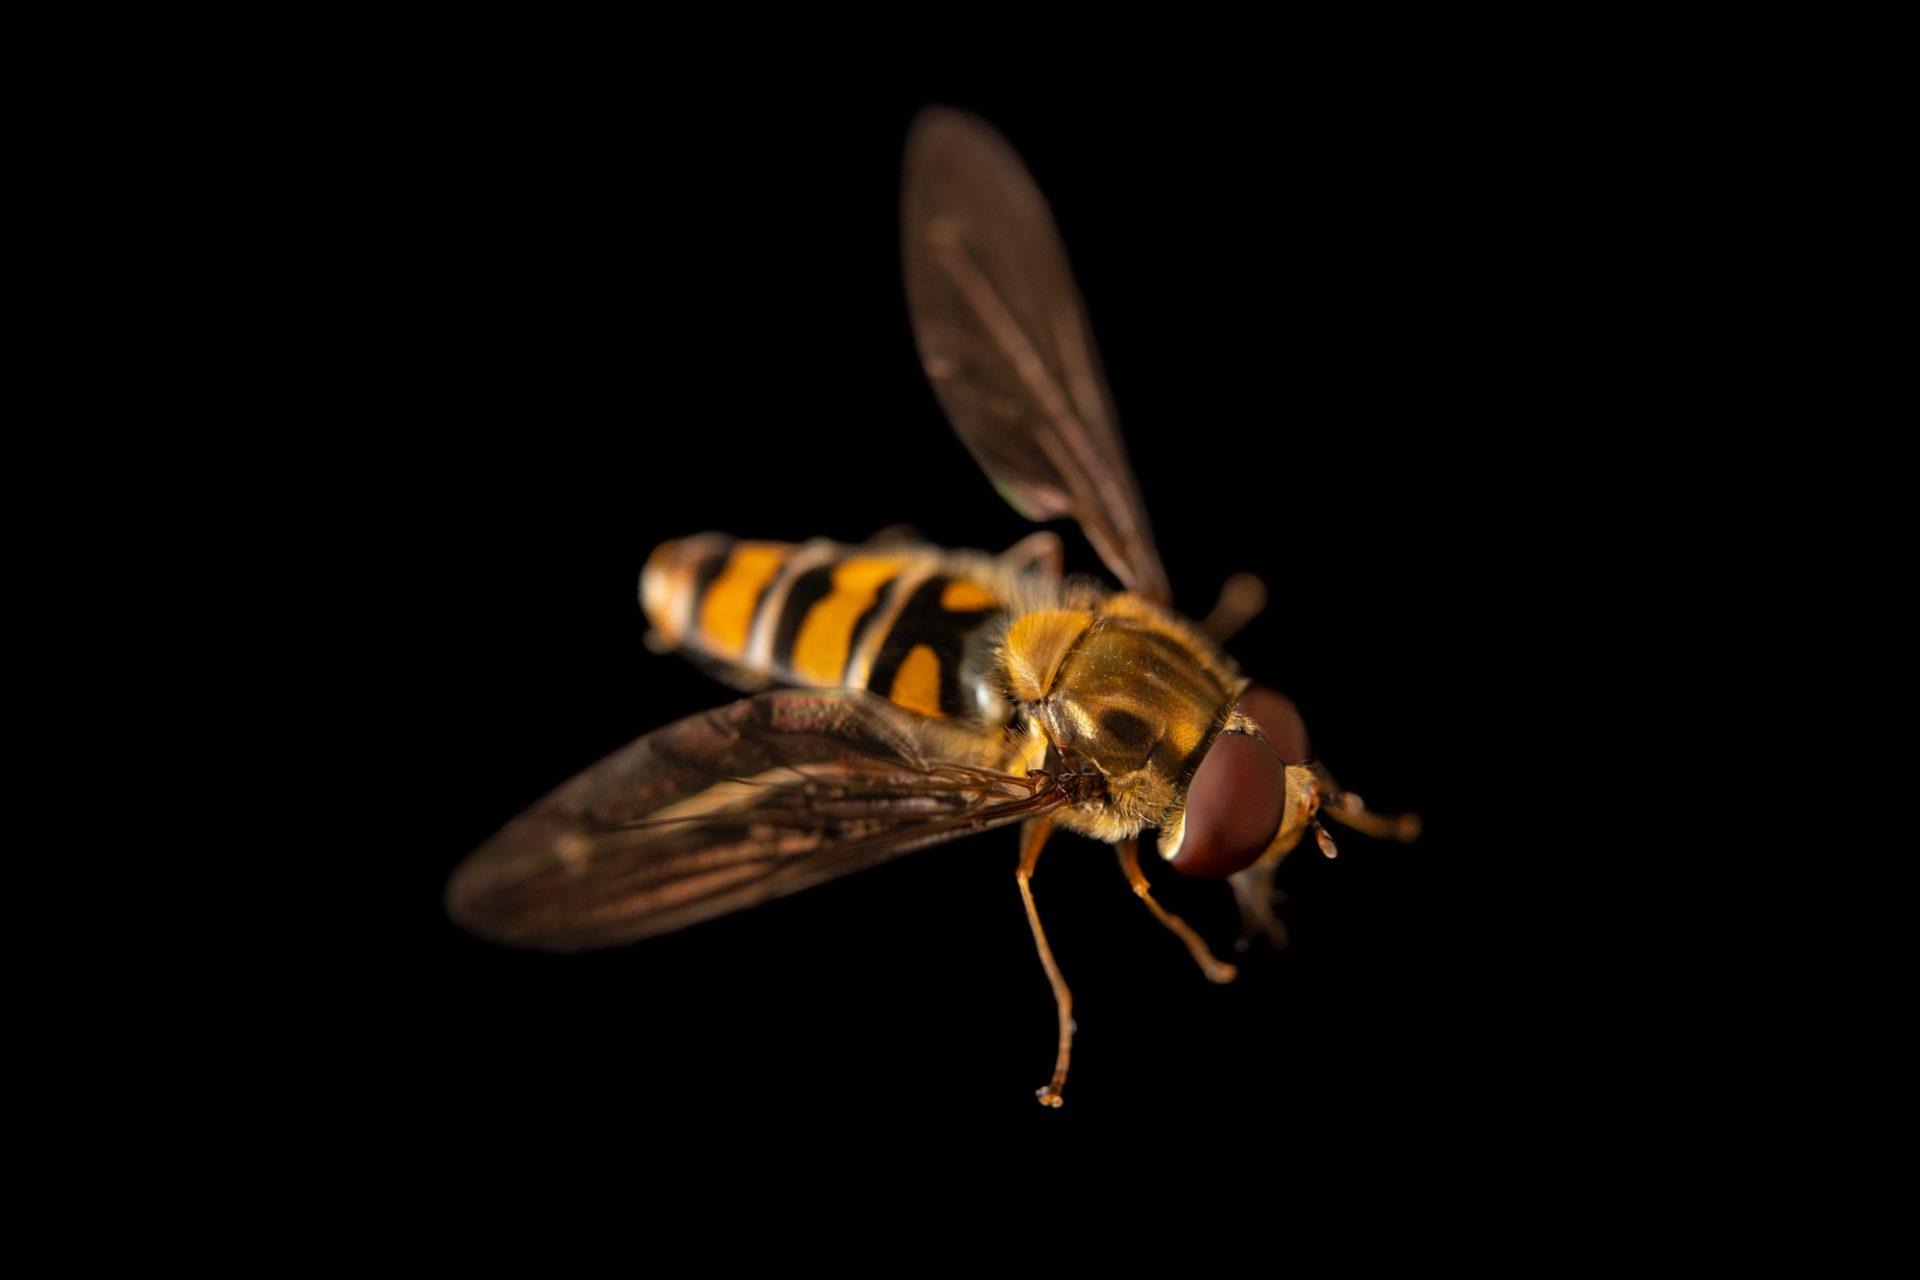 Photo: Hover fly (Episyrphus balteatus) at Graham's Quinta dos Malvedos Vineyard.